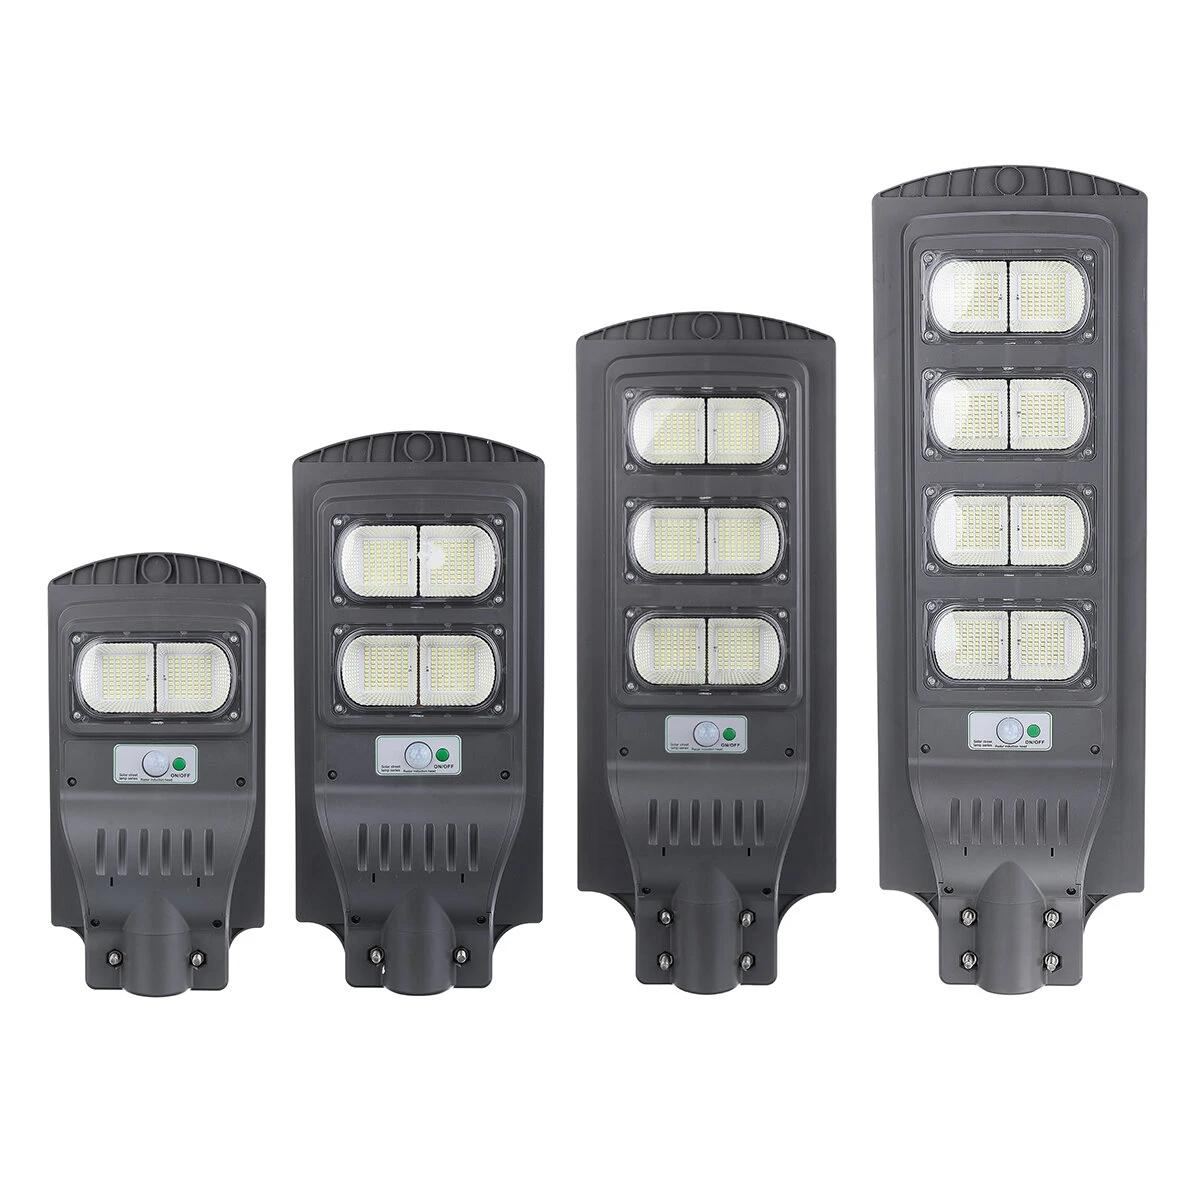 Augienb Solar Powered 140 / 280/420 / 560LED Straßenleuchte PIR Motion Radar Sensor Wasserdichte Outdoor Gartenlampe - 140LED